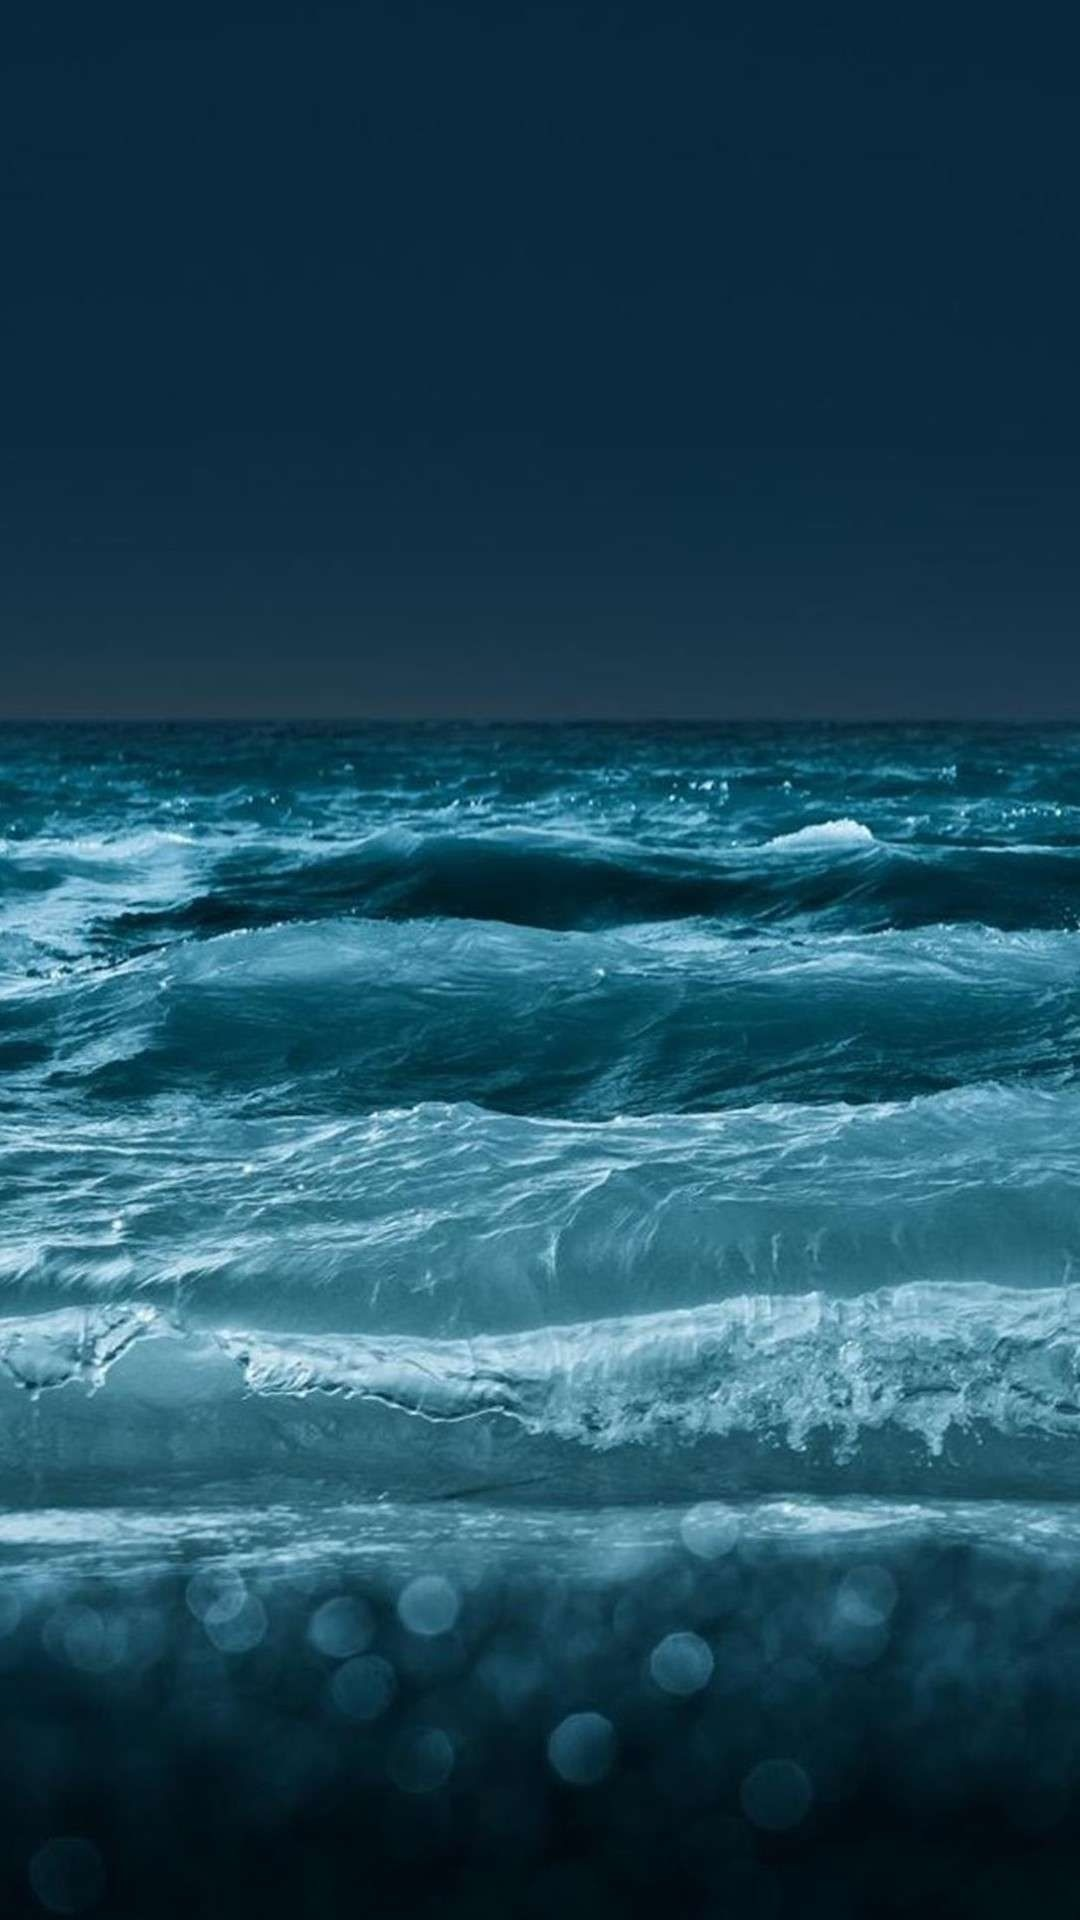 Ocean iphone wallpaper high quality